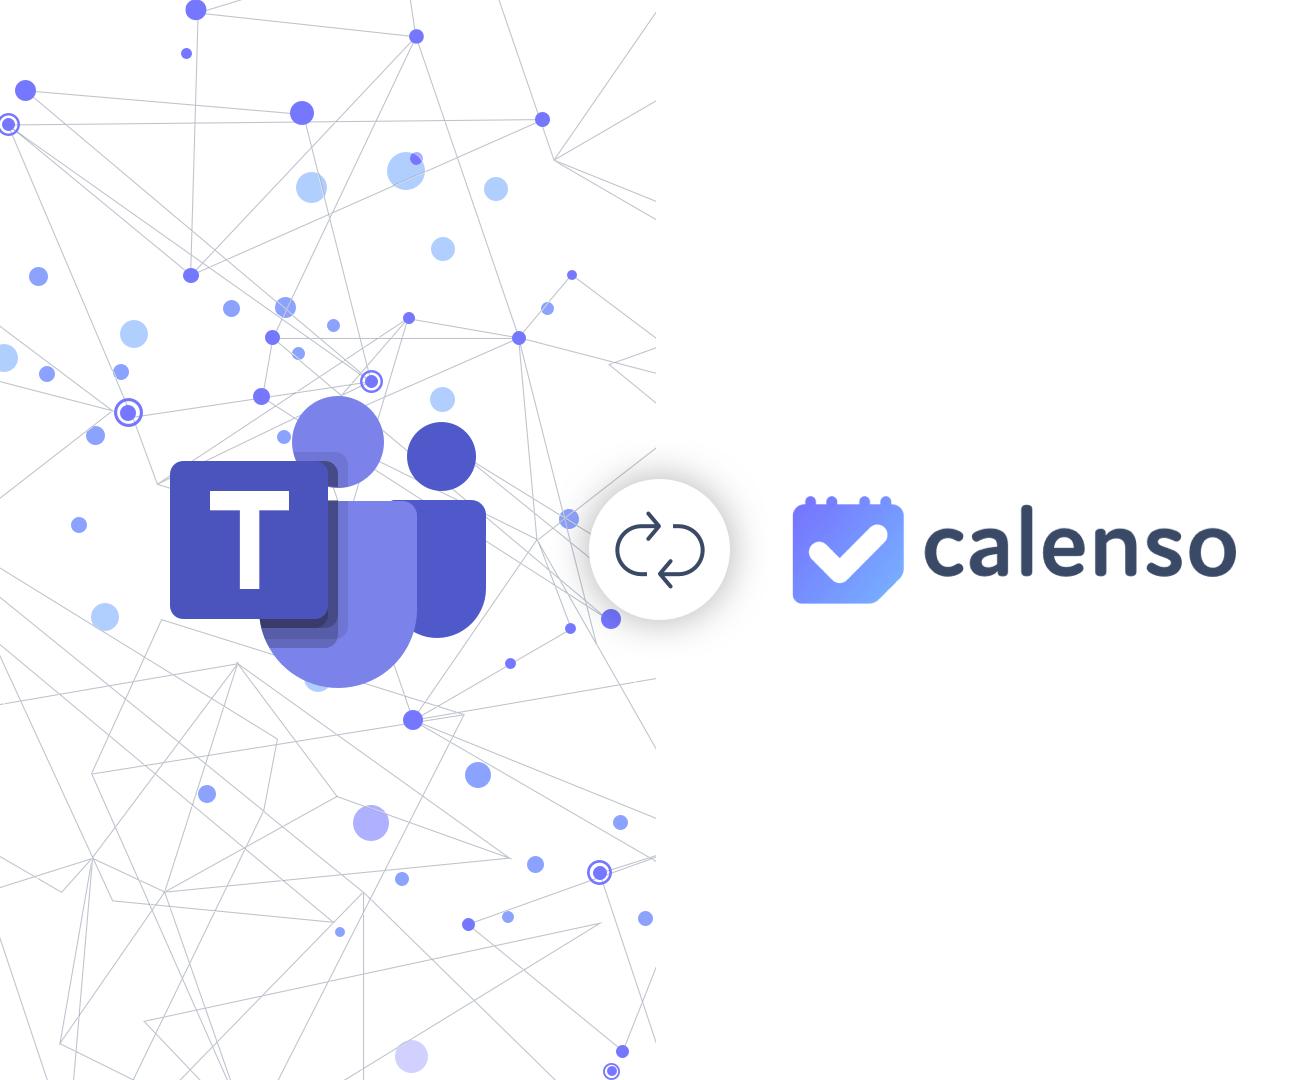 Microsoft Teams and Calenso